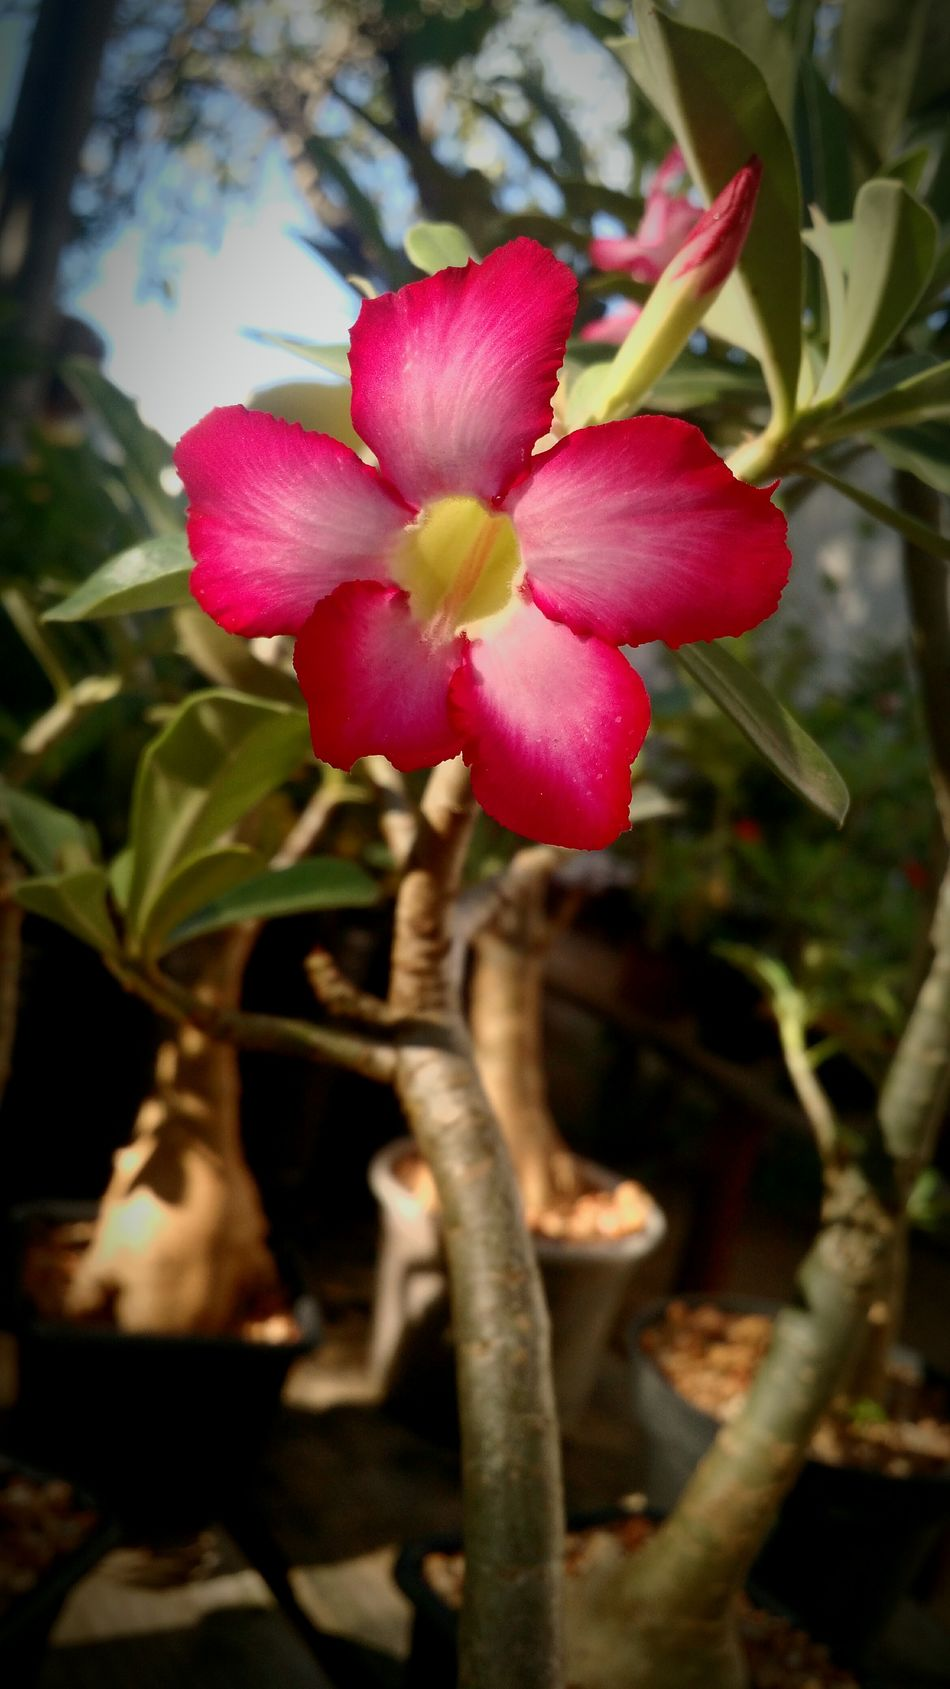 Desertflower Desertrose EyeEm Nature Beautiful Green Light And Shadow Photography Recife EyeEm Team Brazil Olinda EyeEm Best Shots EyeemTeam MotoX2 Flowerofdesert Roseofdesert Sun Sundown